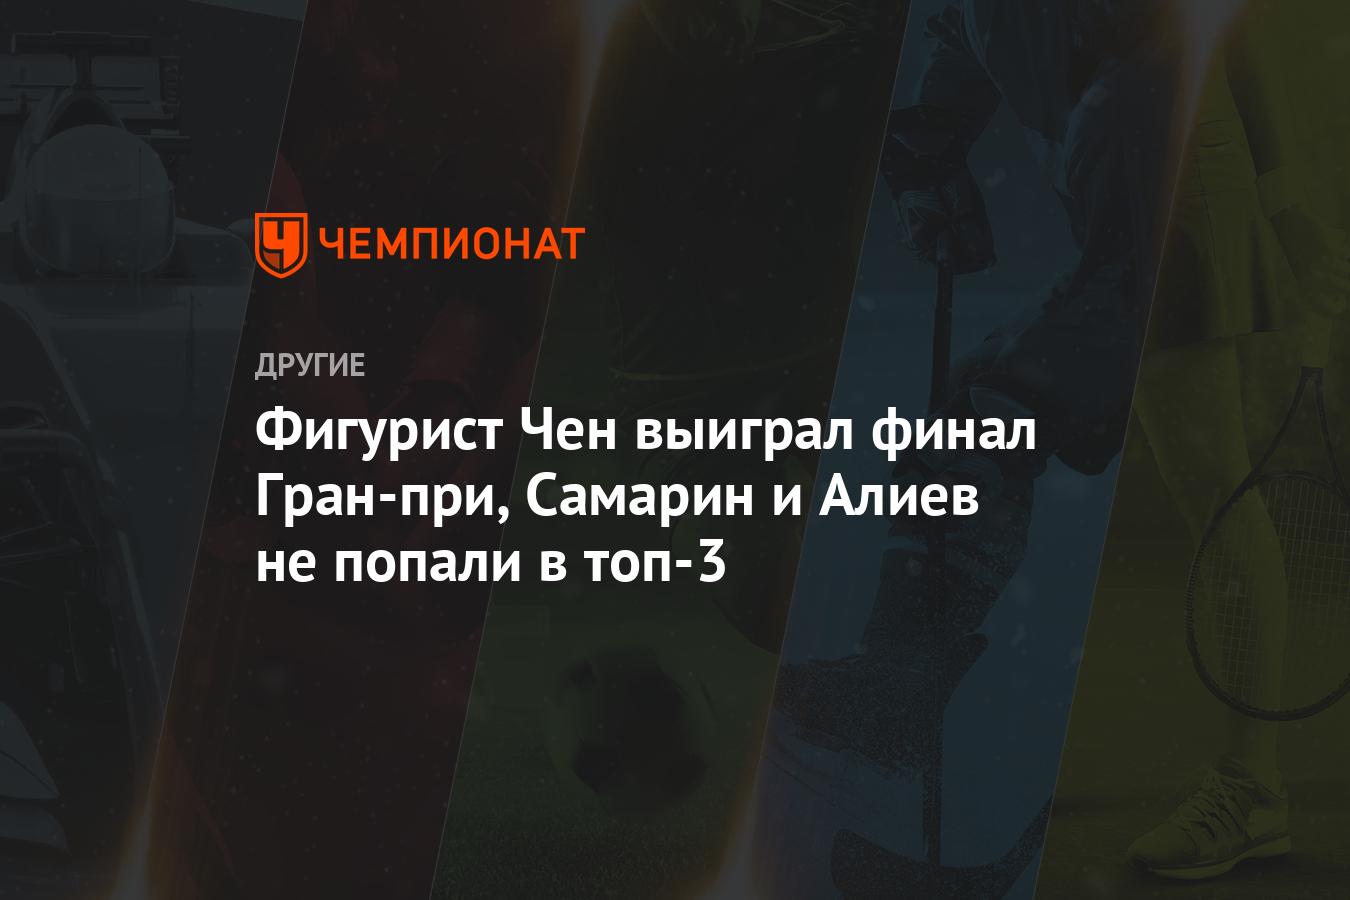 Фигурист Чен выиграл финал Гран-при, Самарин и Алиев не попали в топ-3